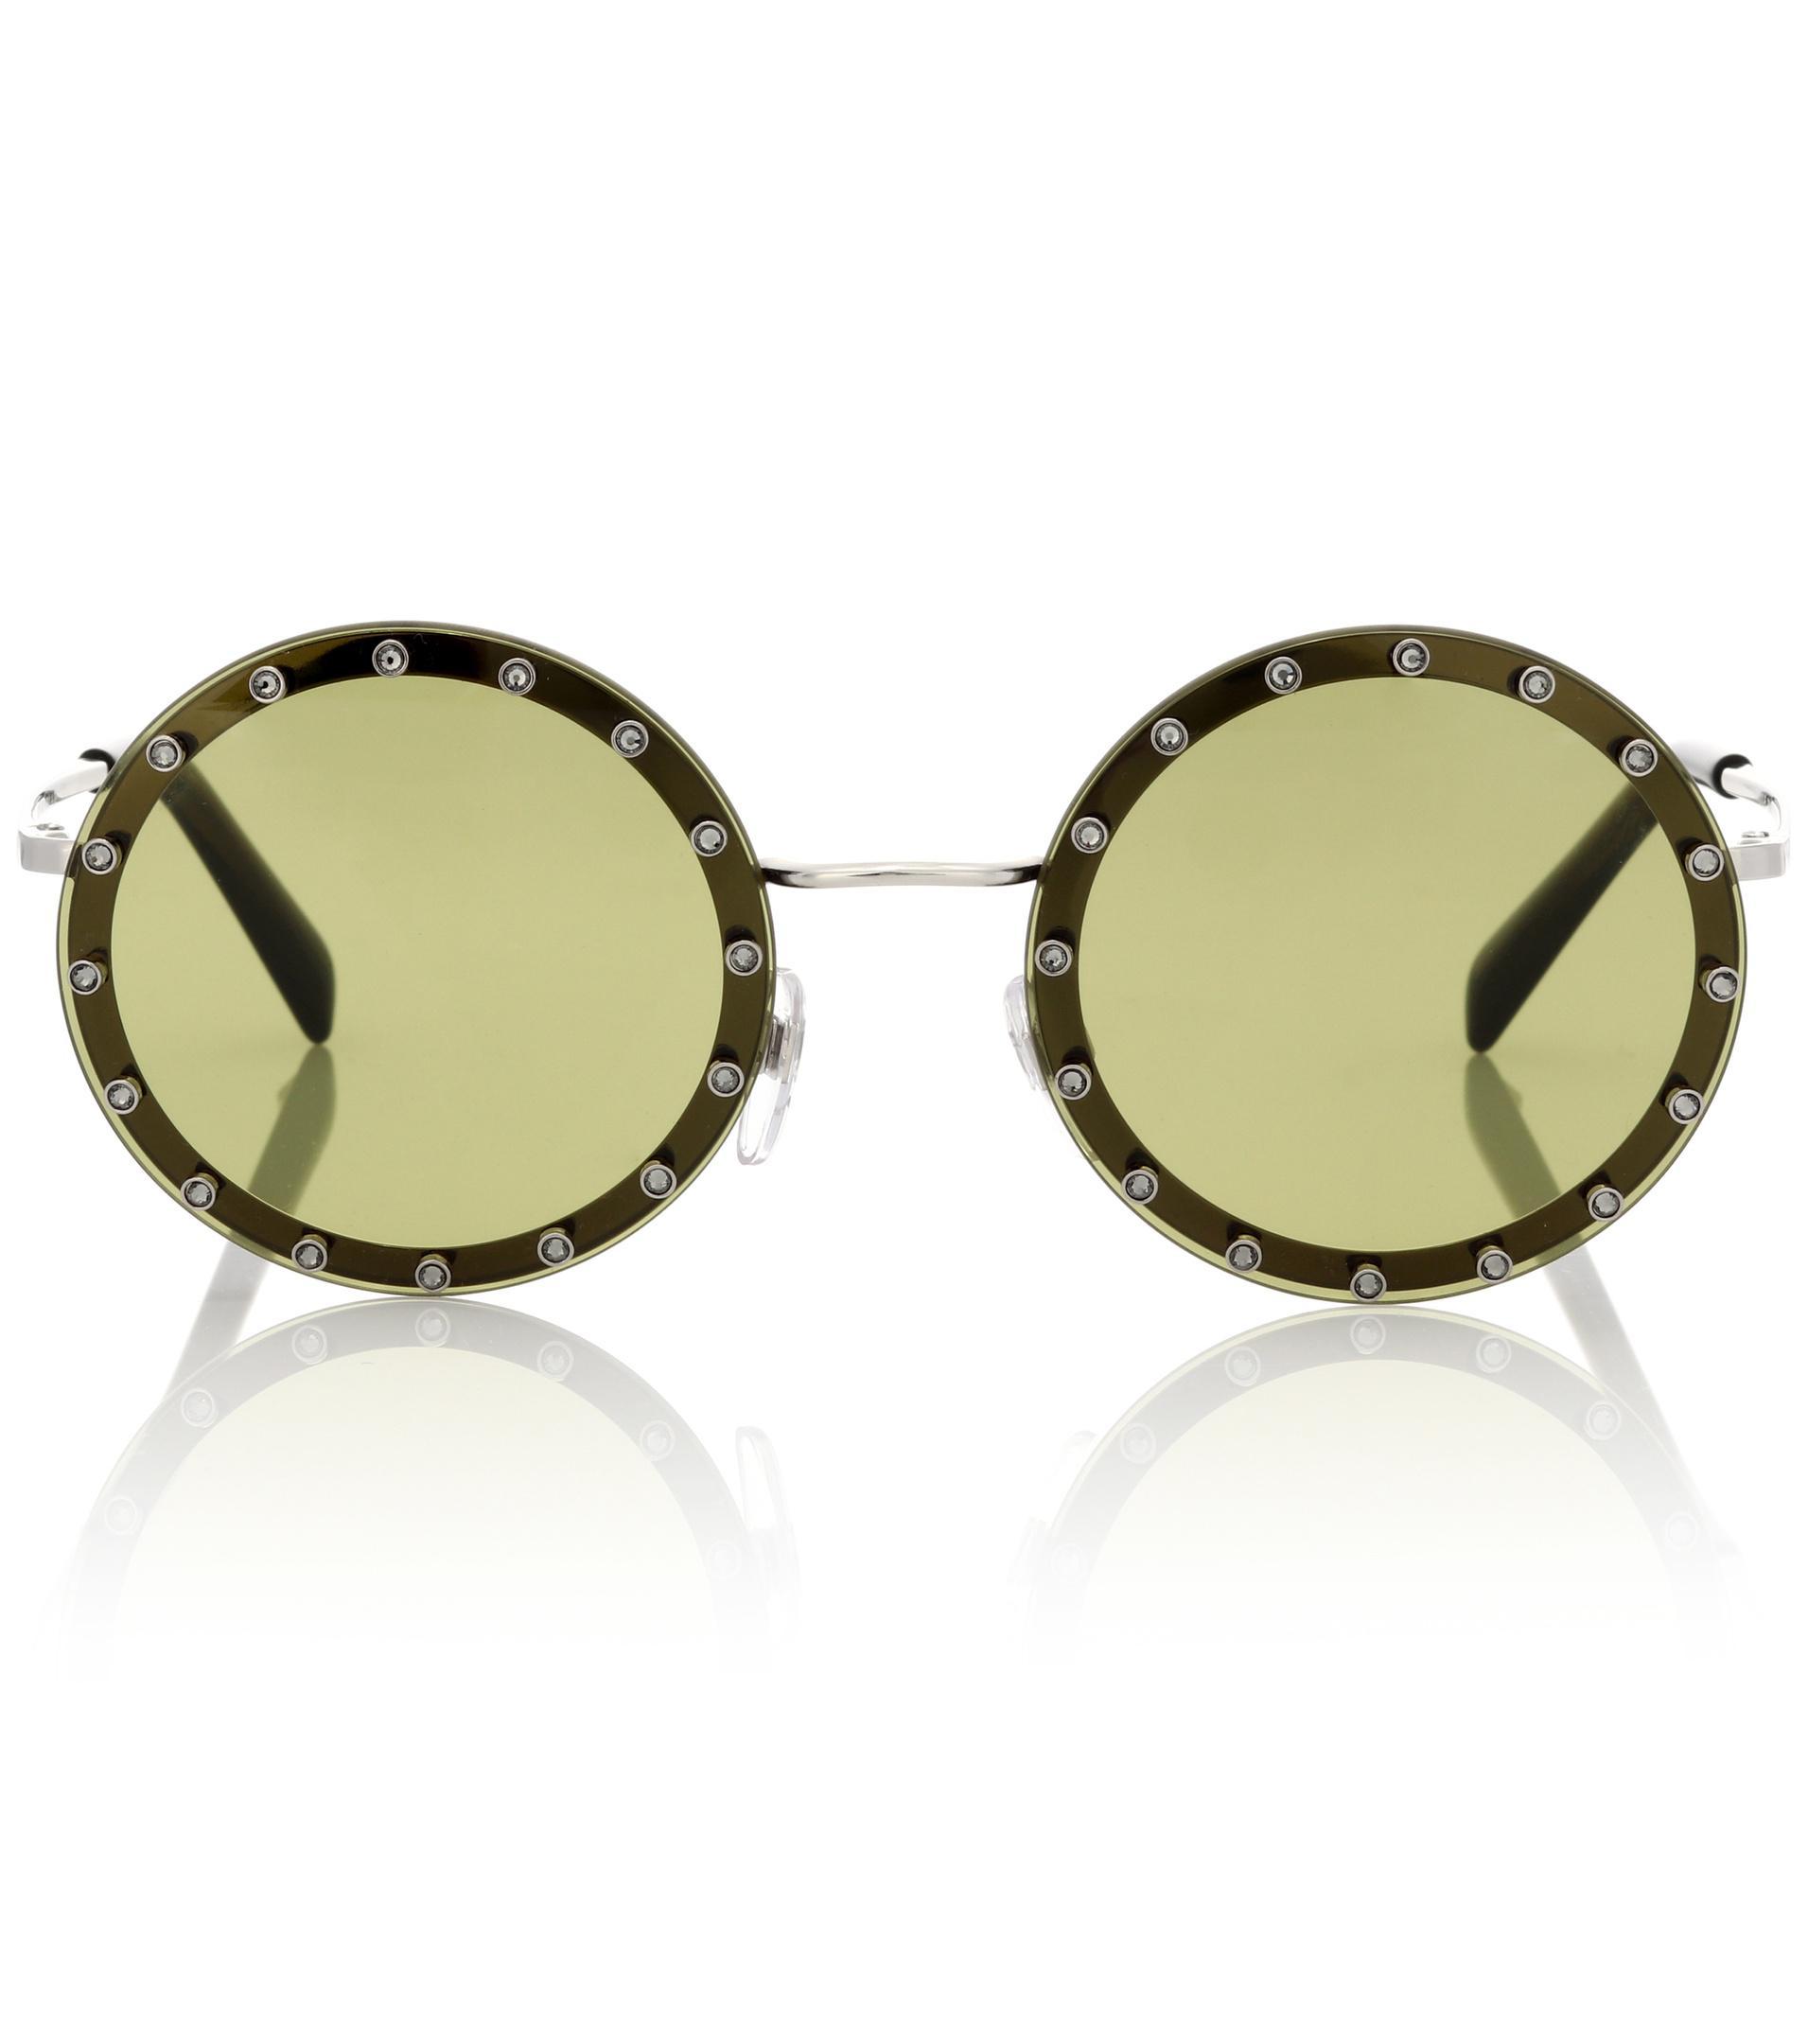 Garavani round sunglasses Valentino pnYh7GargN